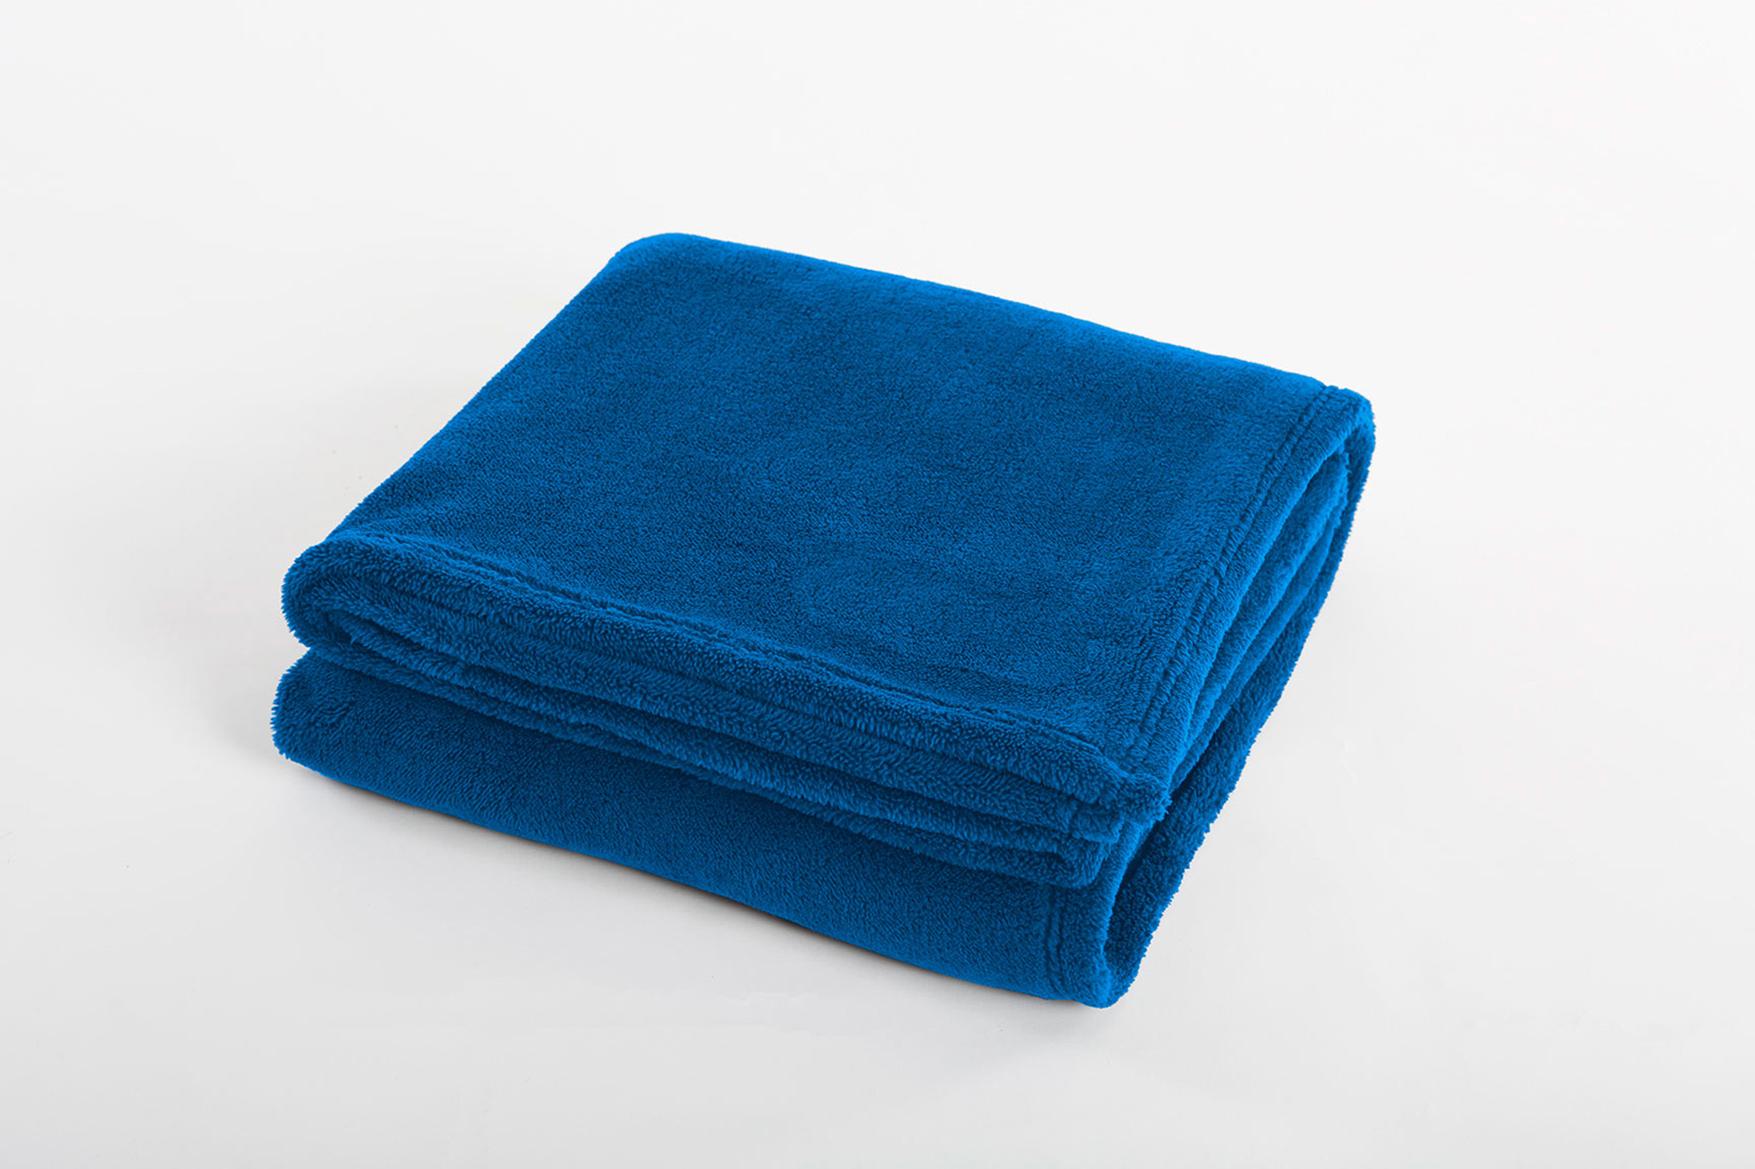 soft_touch_velura_cobalt_blue_2